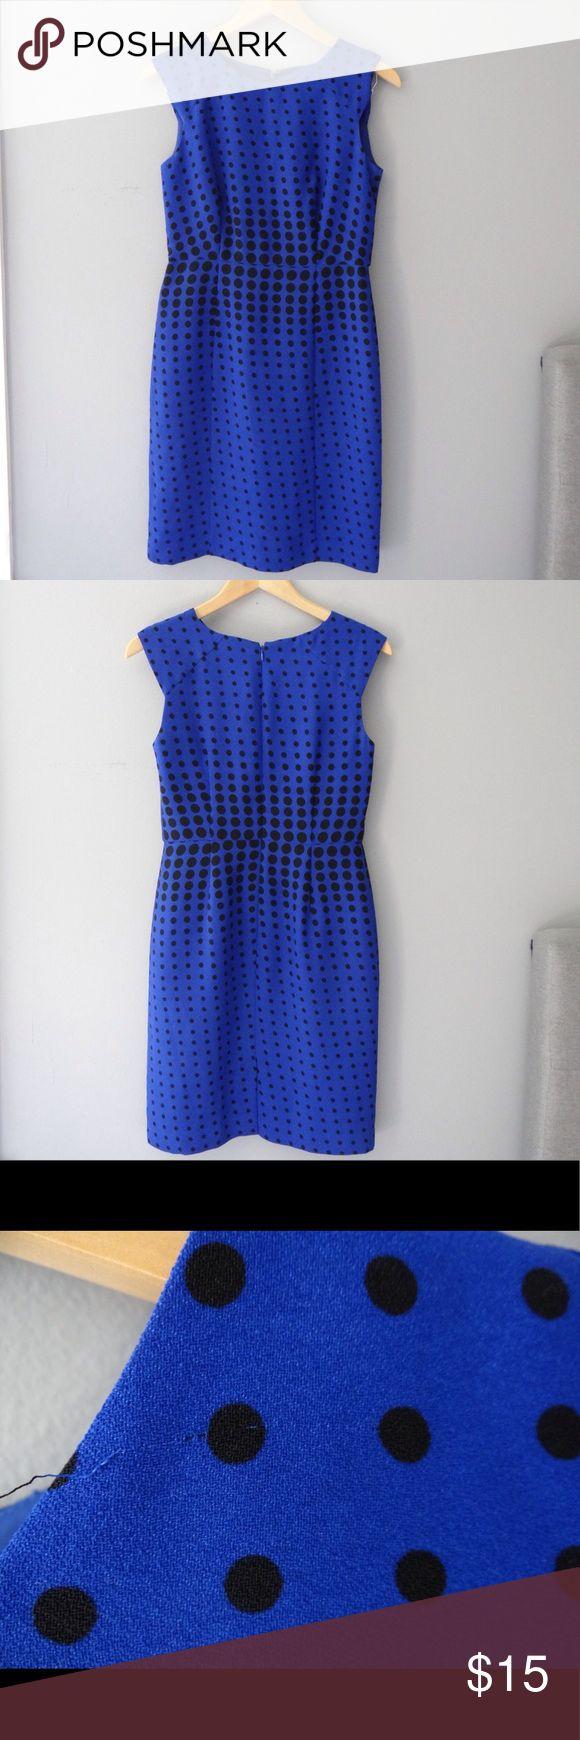 Ann Taylor factory sleeveless dress Pre loved Ann Taylor factory linned sleeveless dress. Ann Taylor Factory Dresses